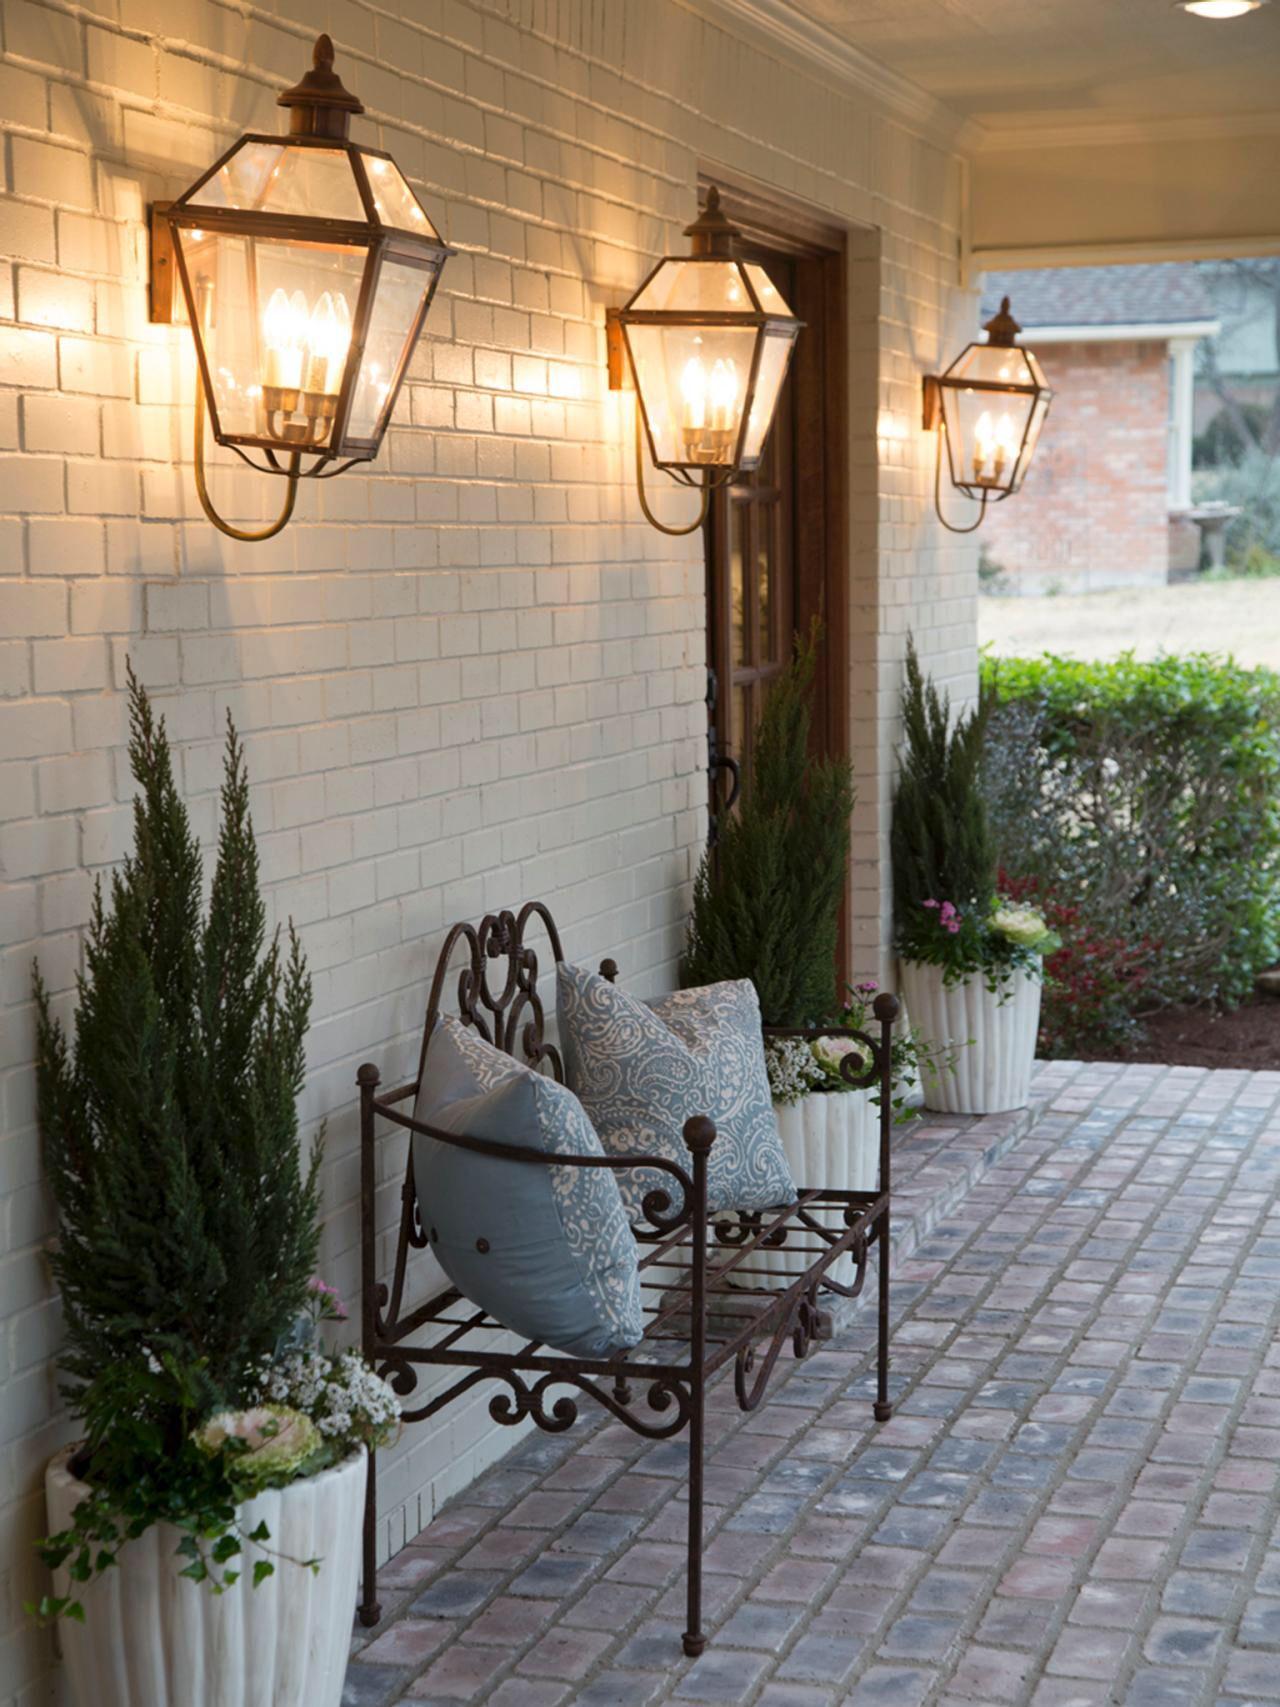 Image from http://hgtvhome.sndimg.com/content/dam/images/hgtv/fullset/2014/8/19/0/HFXUP108H_322944_sander_french-doors_entryway_lighting.jpg.rend.hgtvcom.1280.1707.jpeg.